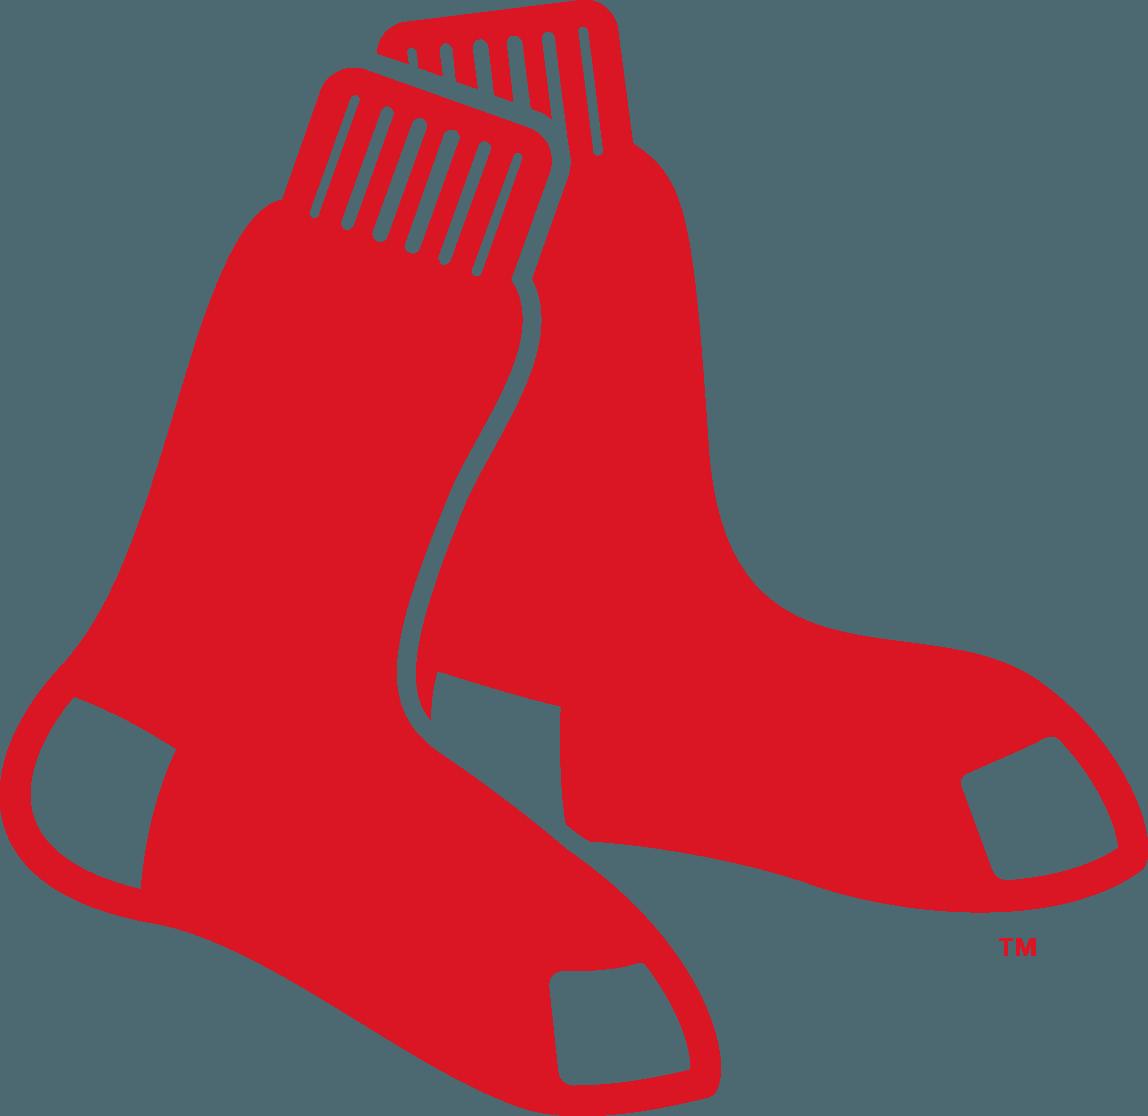 boston red sox logo redsox com vector eps free download logo rh freelogovectors net boston red sox vector logo download red sox vector logo download